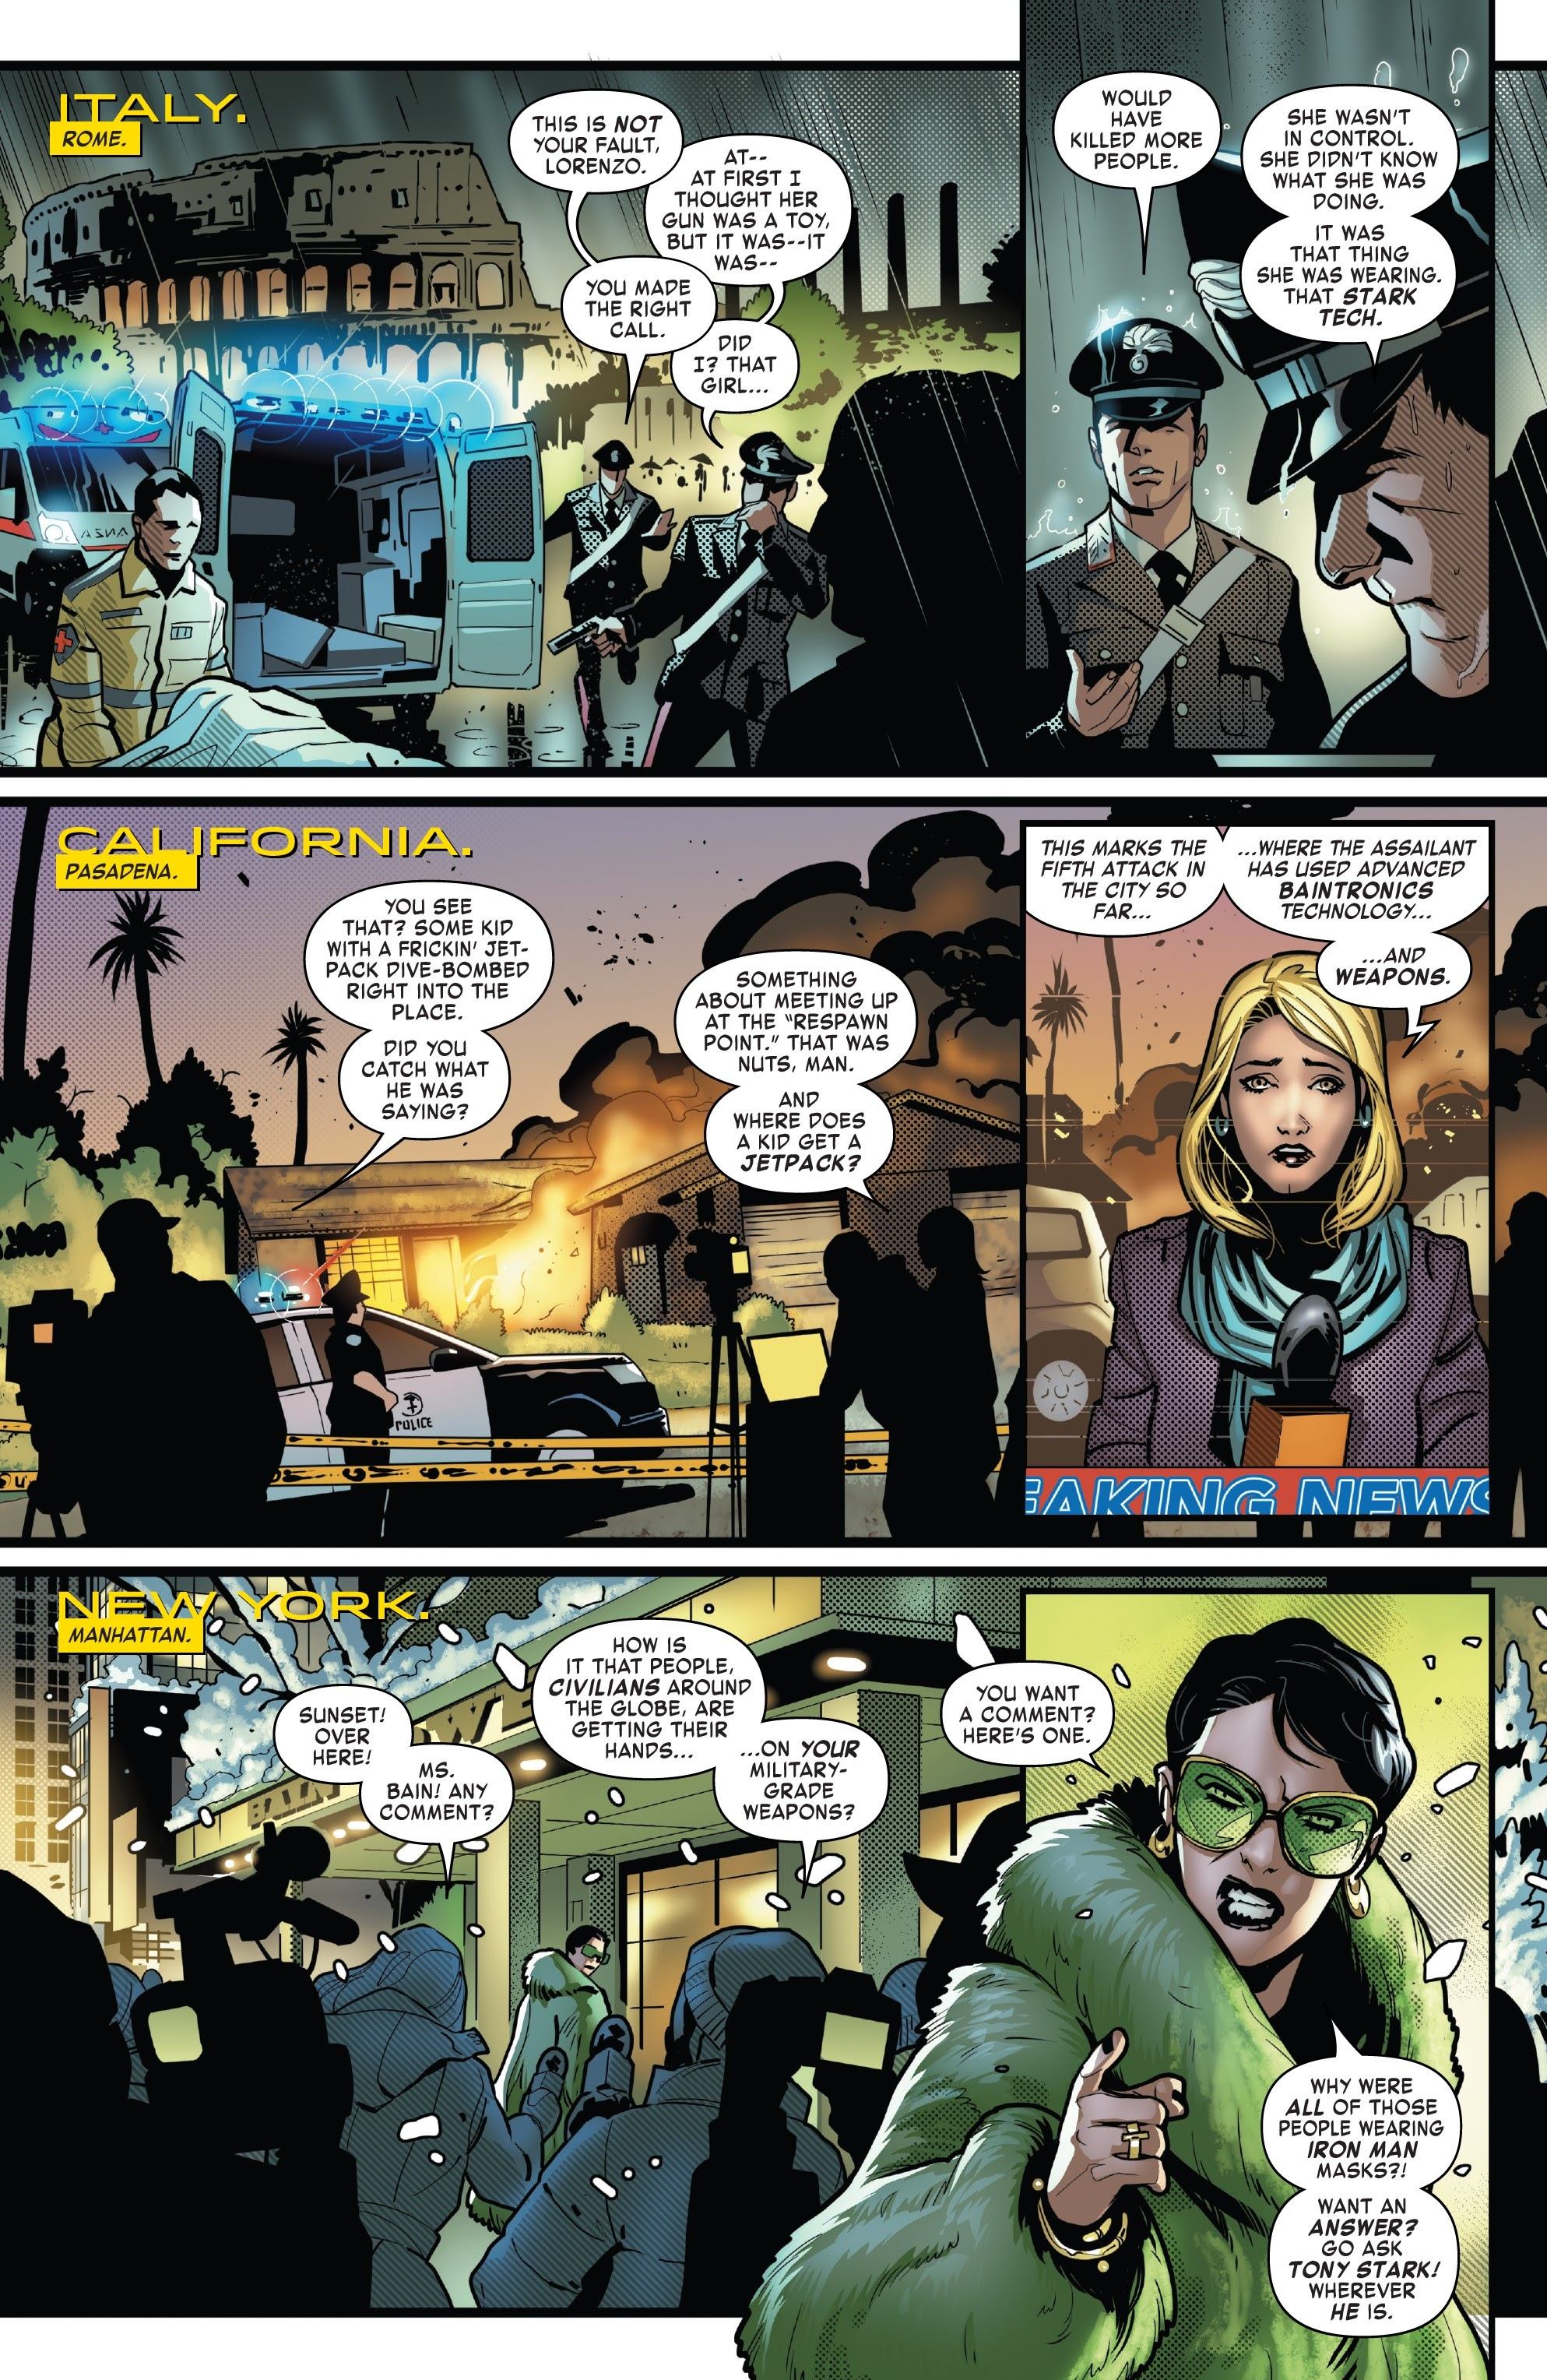 Read online Tony Stark: Iron Man comic -  Issue #8 - 4